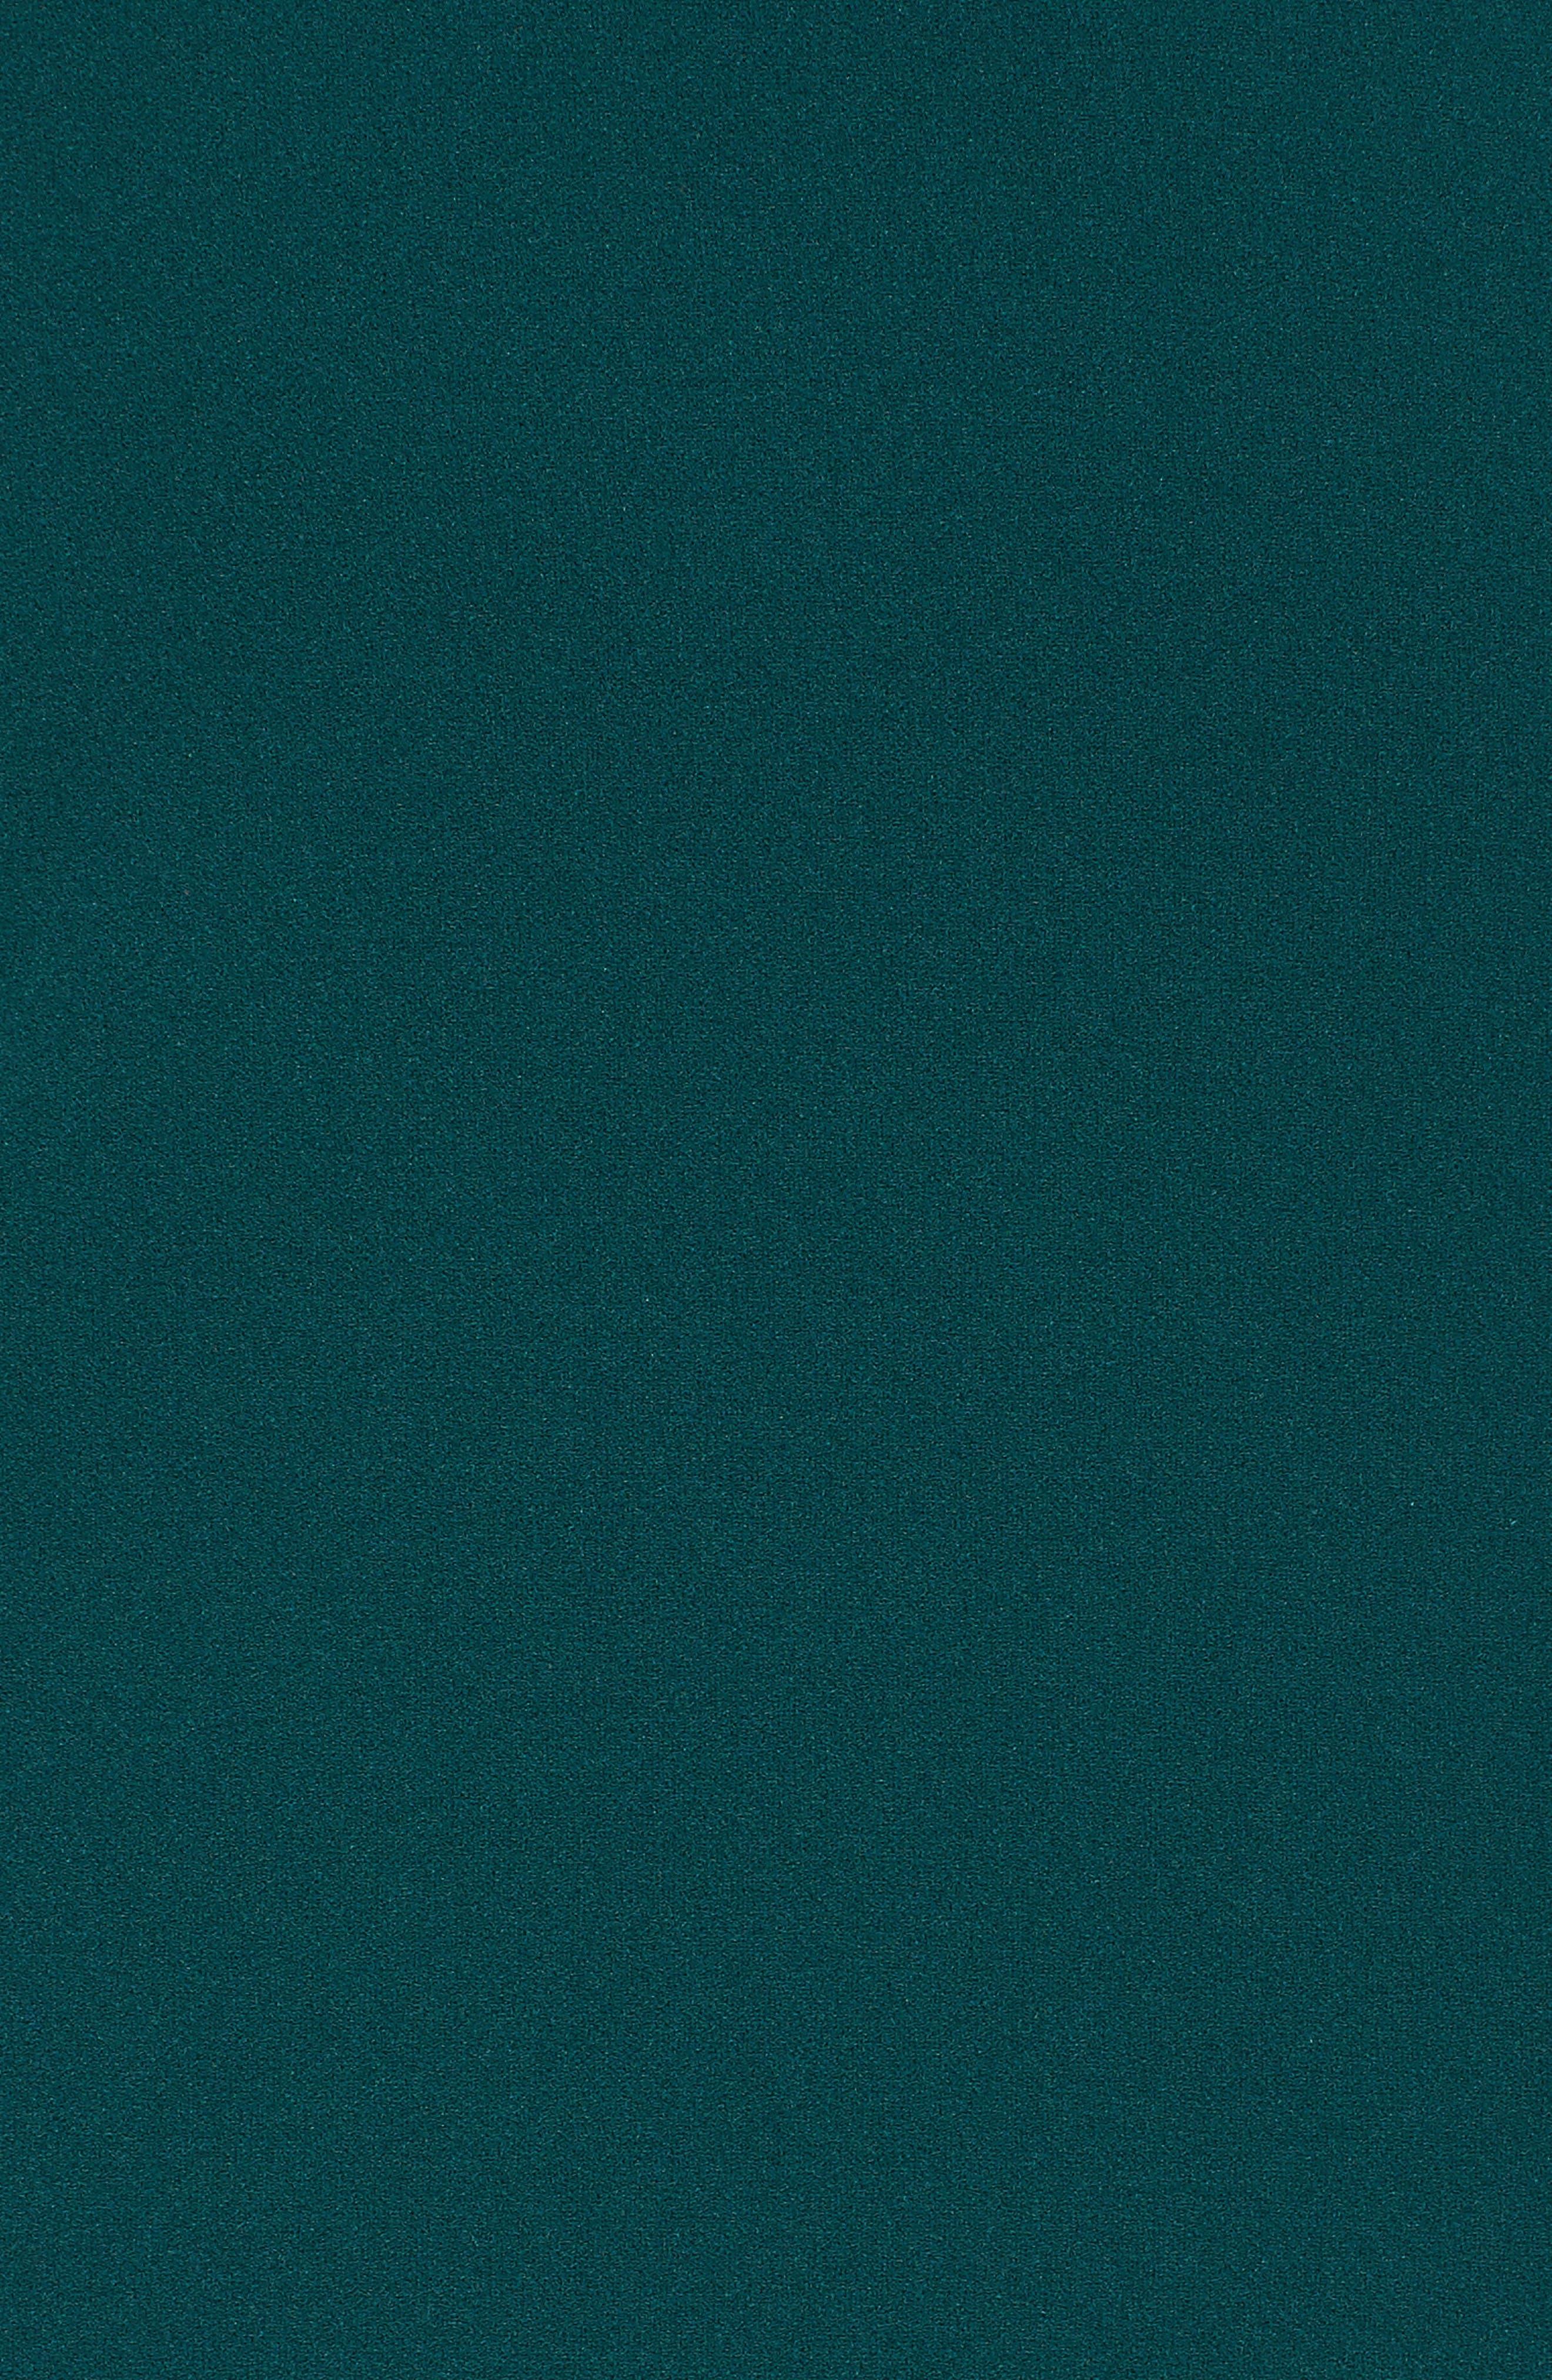 Scuba Crepe Sheath Dress,                             Alternate thumbnail 5, color,                             389